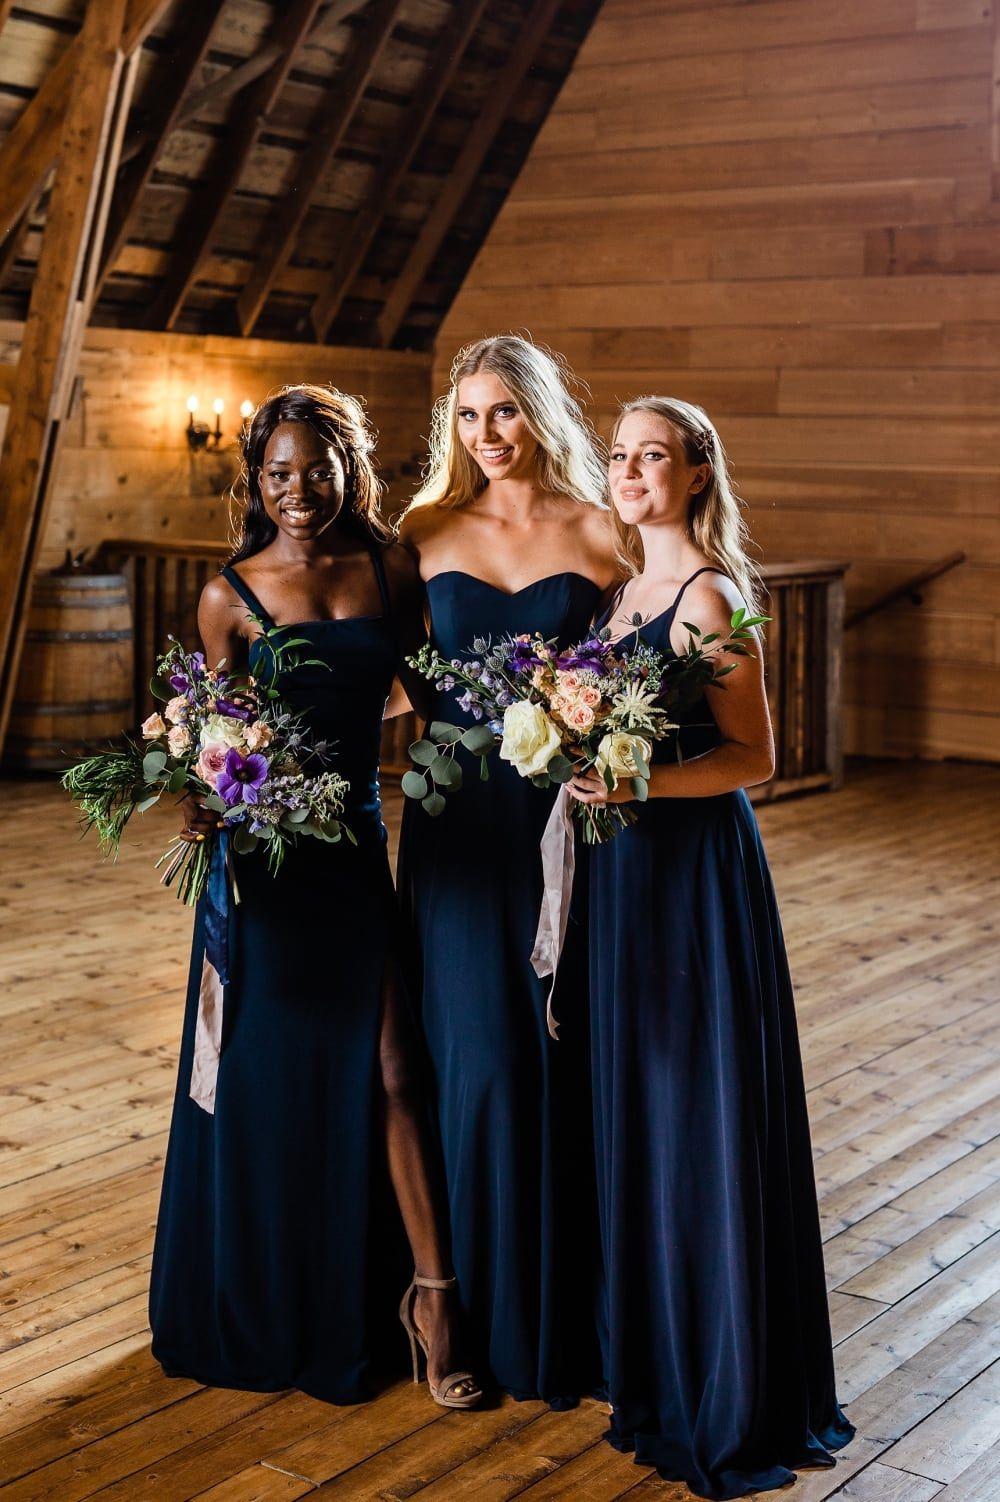 Affordable Navy Blue Bridesmaid Dresses Long Blue Bridesmaid Dresses Fro Navy Blue Bridesmaid Dresses Dessy Bridesmaid Dresses Blue Bridesmaid Dresses Boho [ 1502 x 1000 Pixel ]